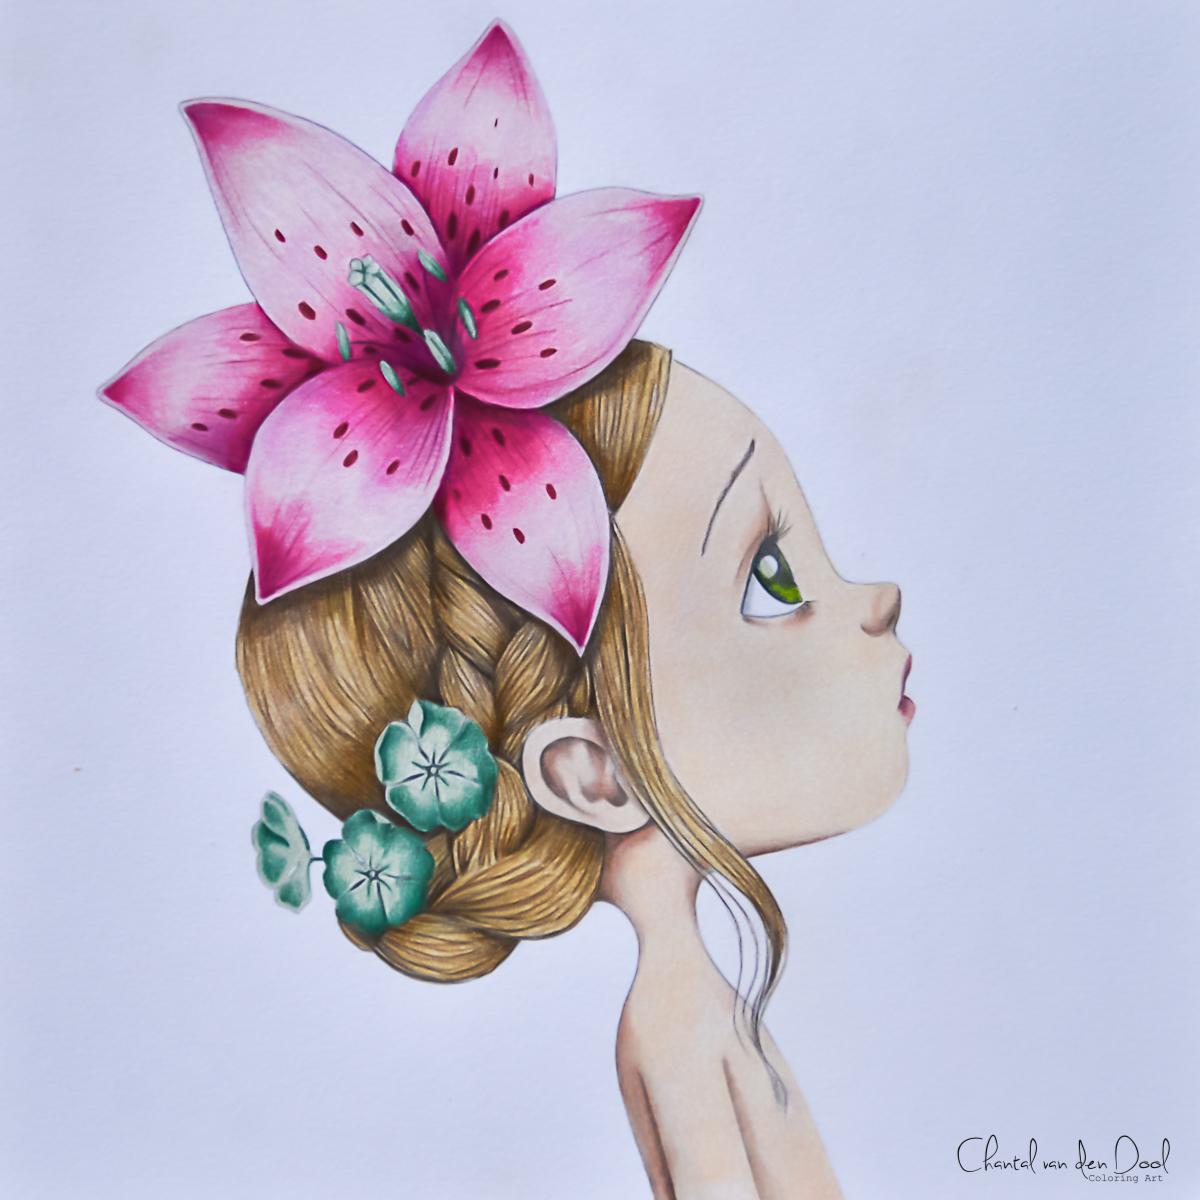 Emanuelle Colin Coloringbychantal